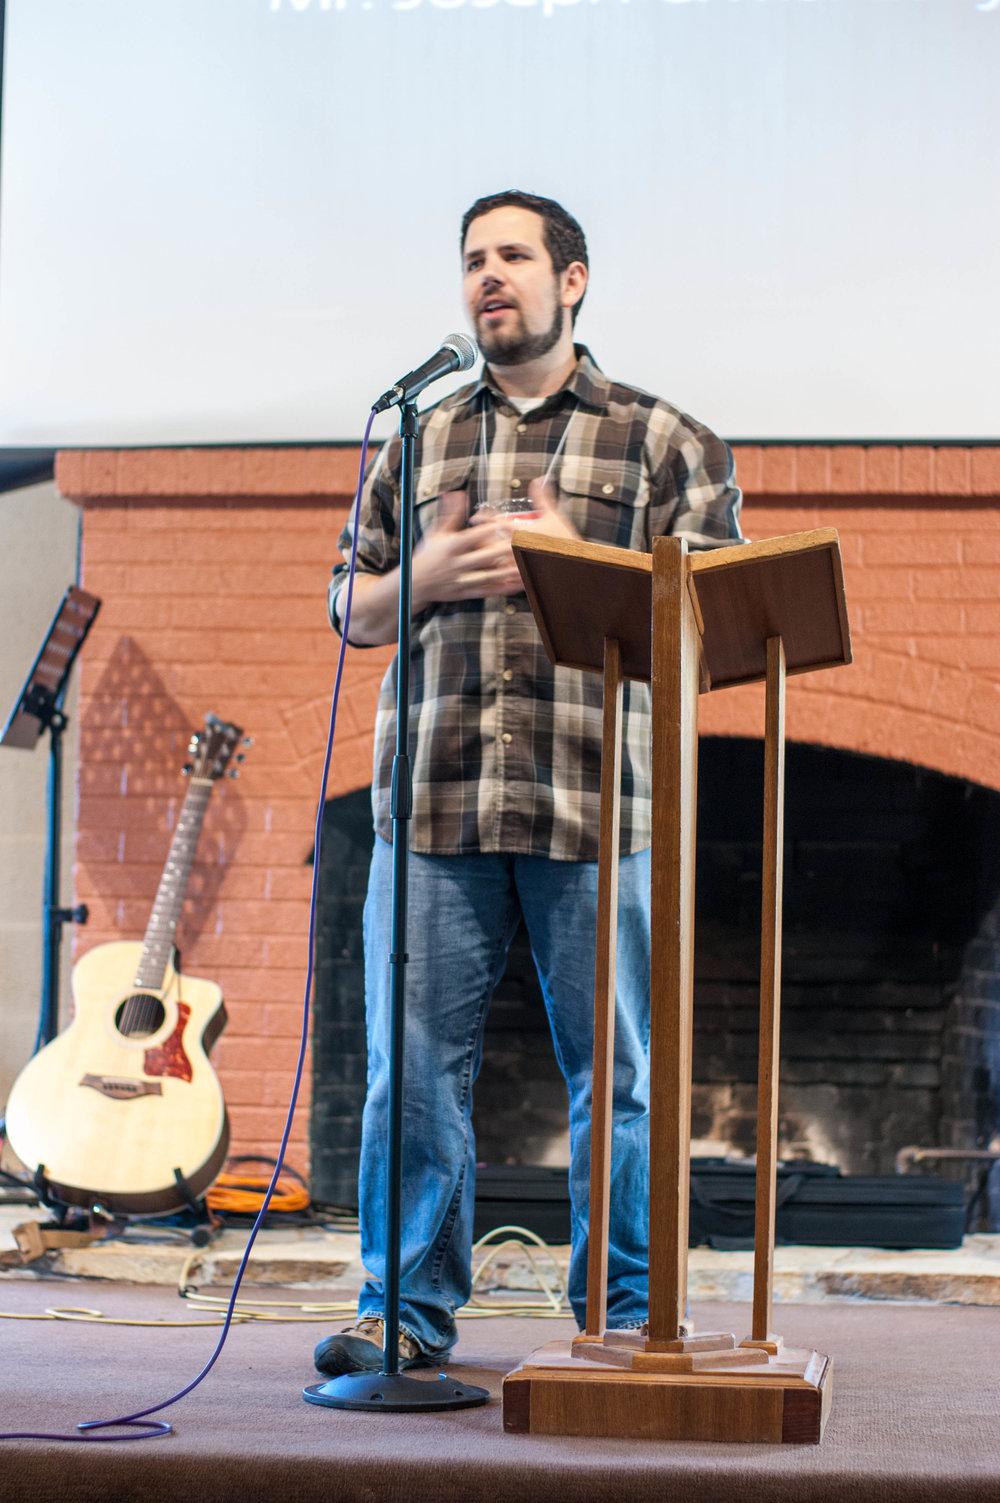 Joseph leading Youth Group service